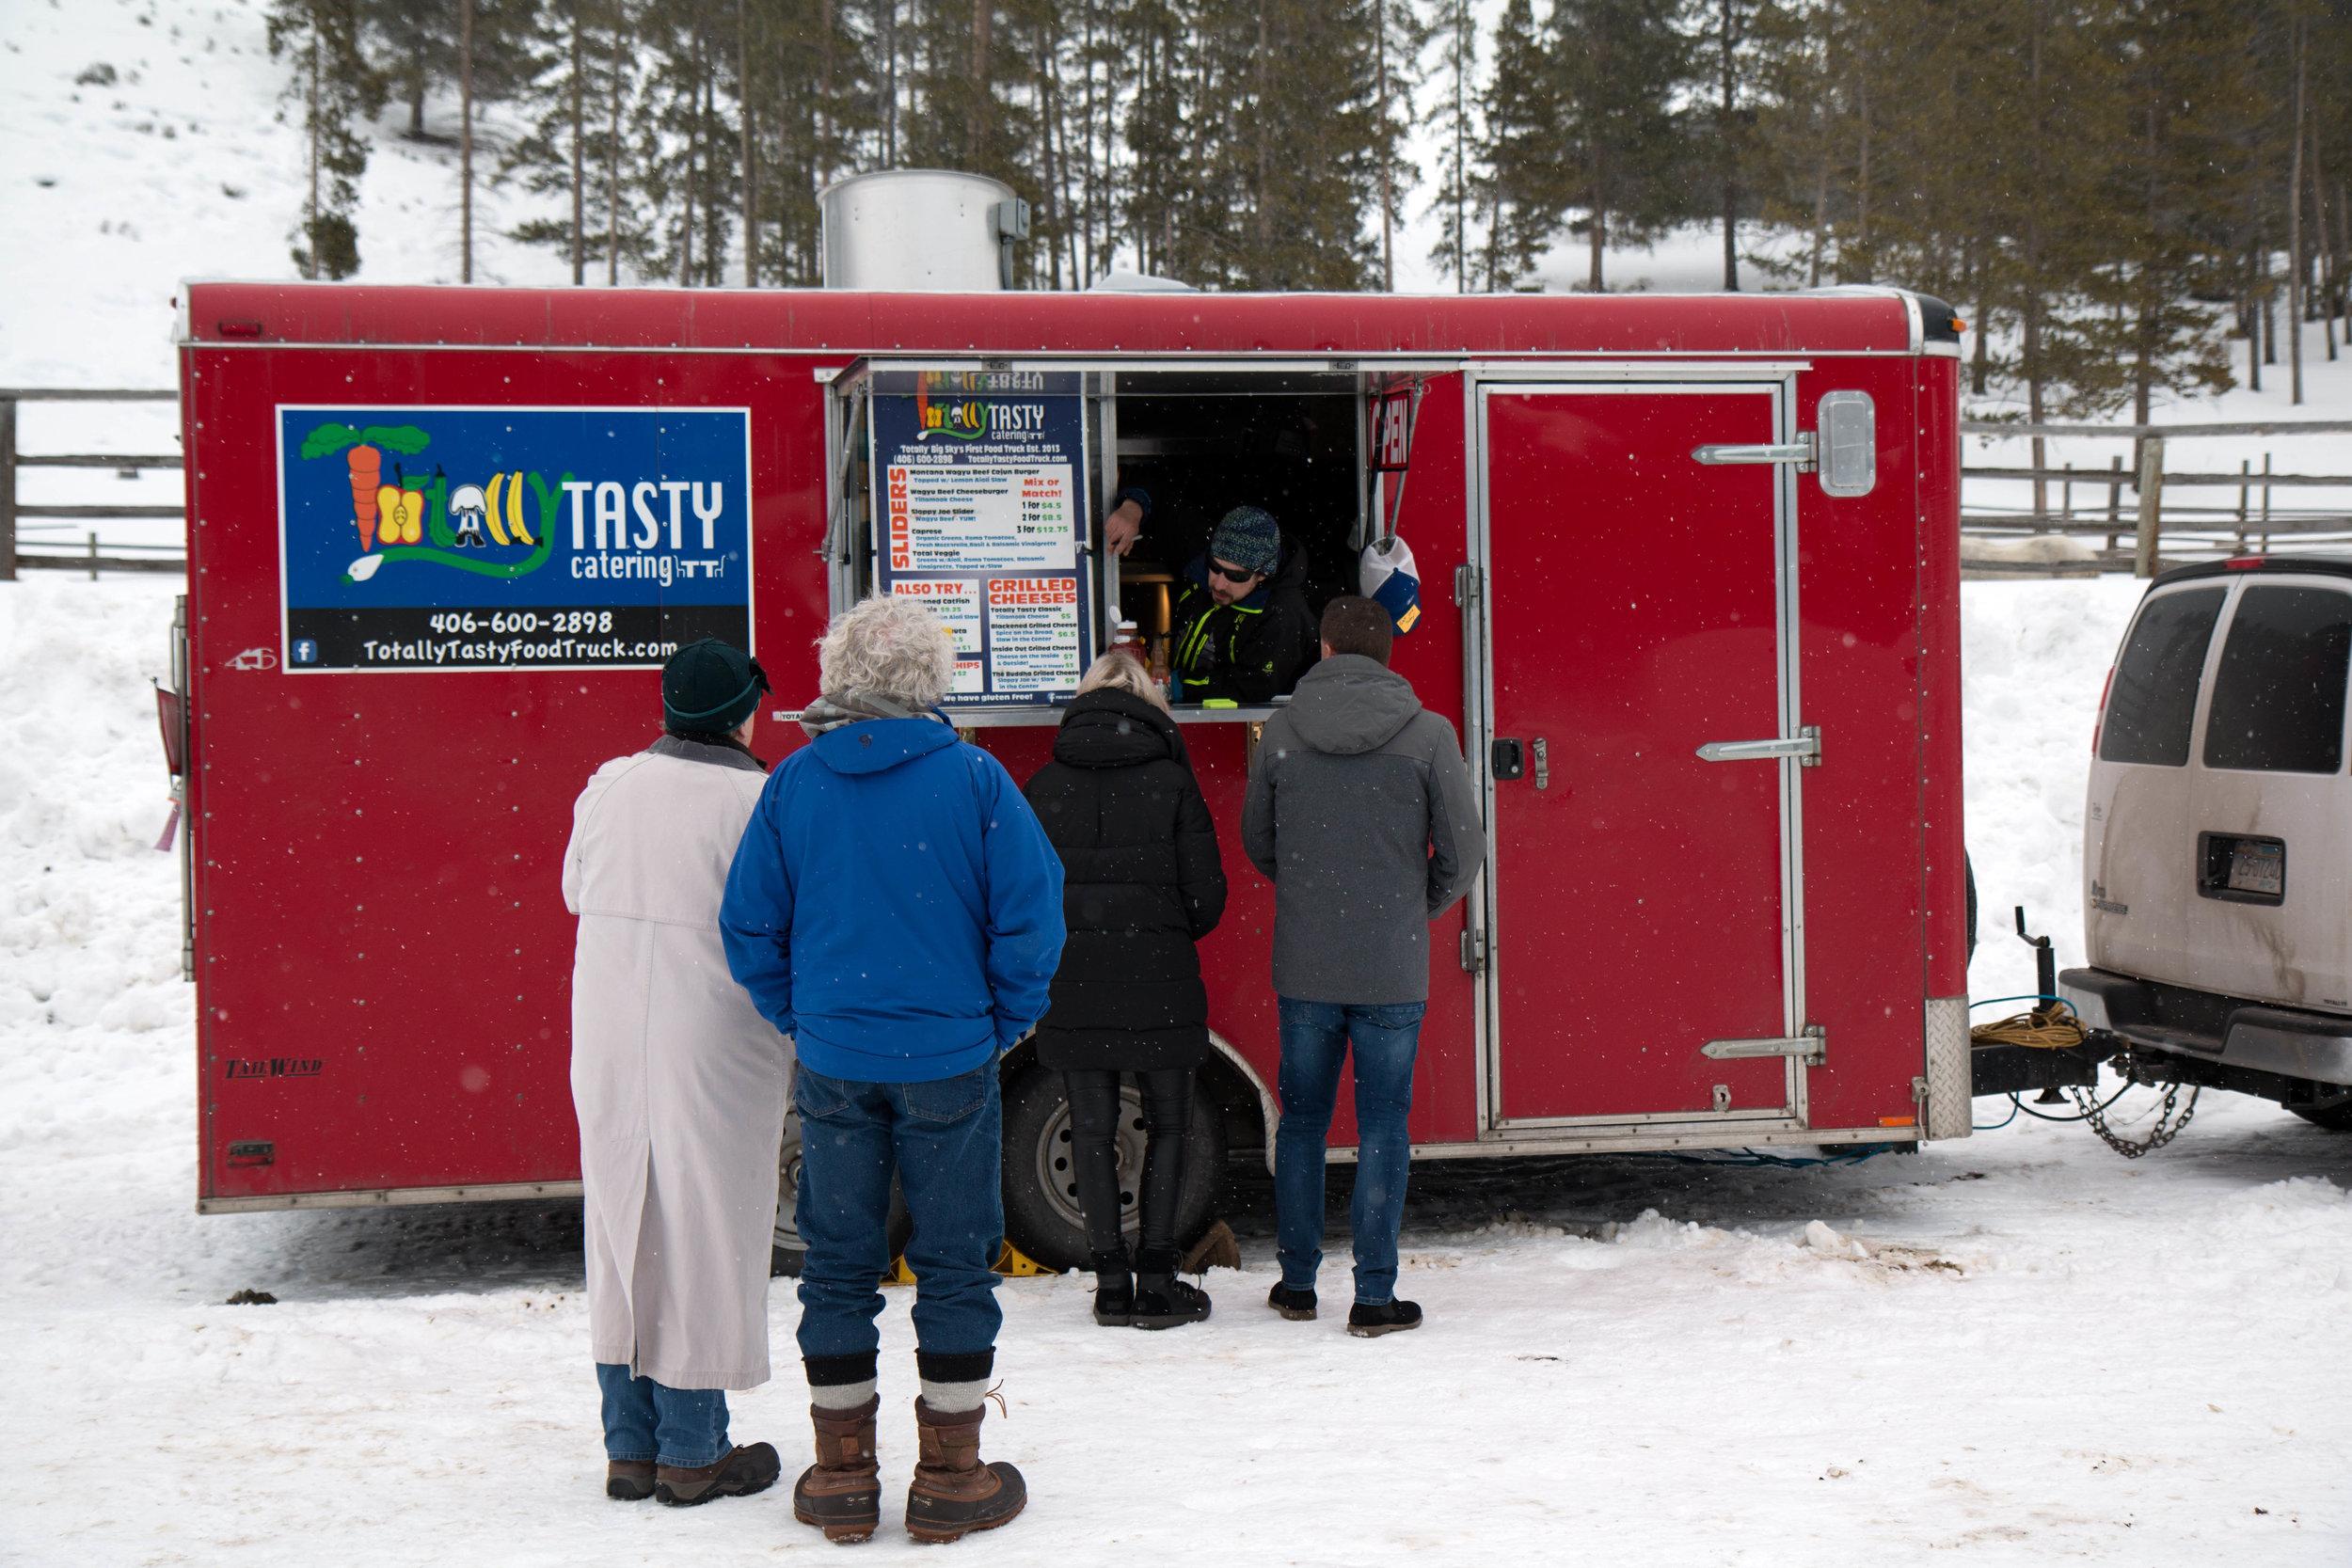 Totally Tasty Food Truck, Bozeman, Montana